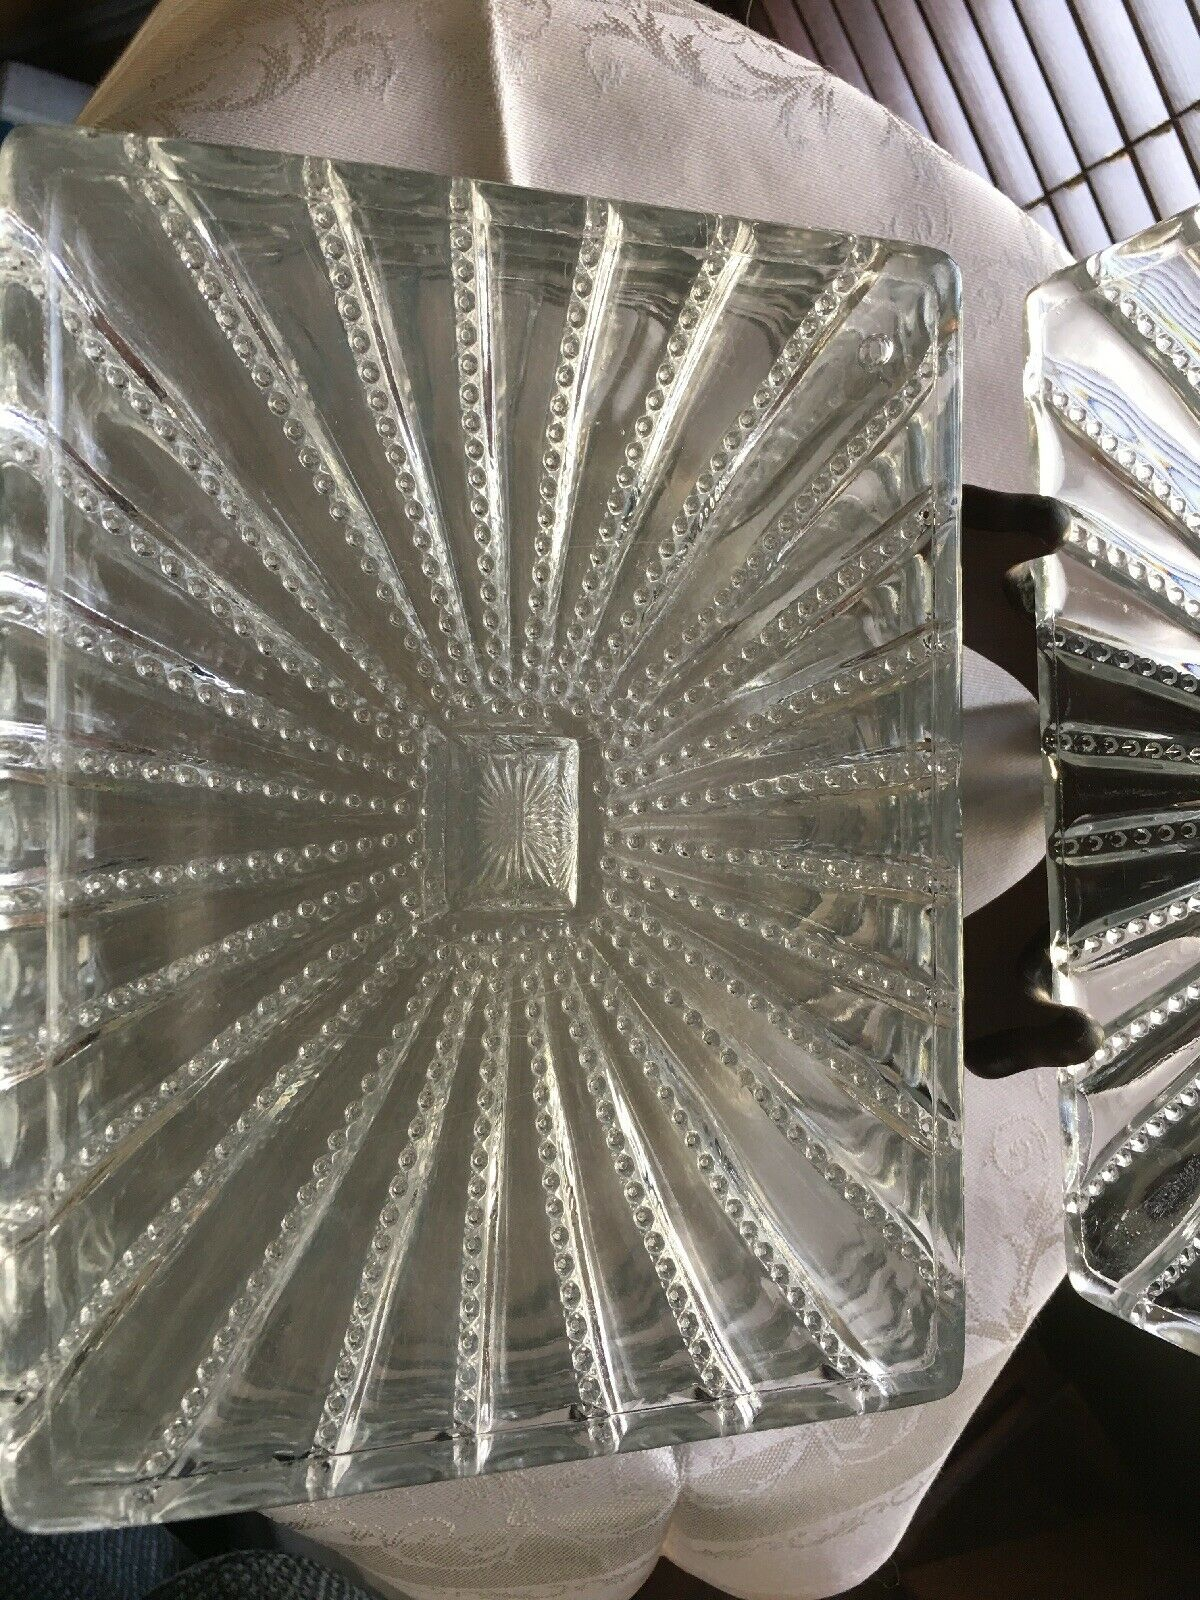 Rare Antique Cut Glass Crystal Sandwich/Luncheon Plates-Set Of 6- - $199.99